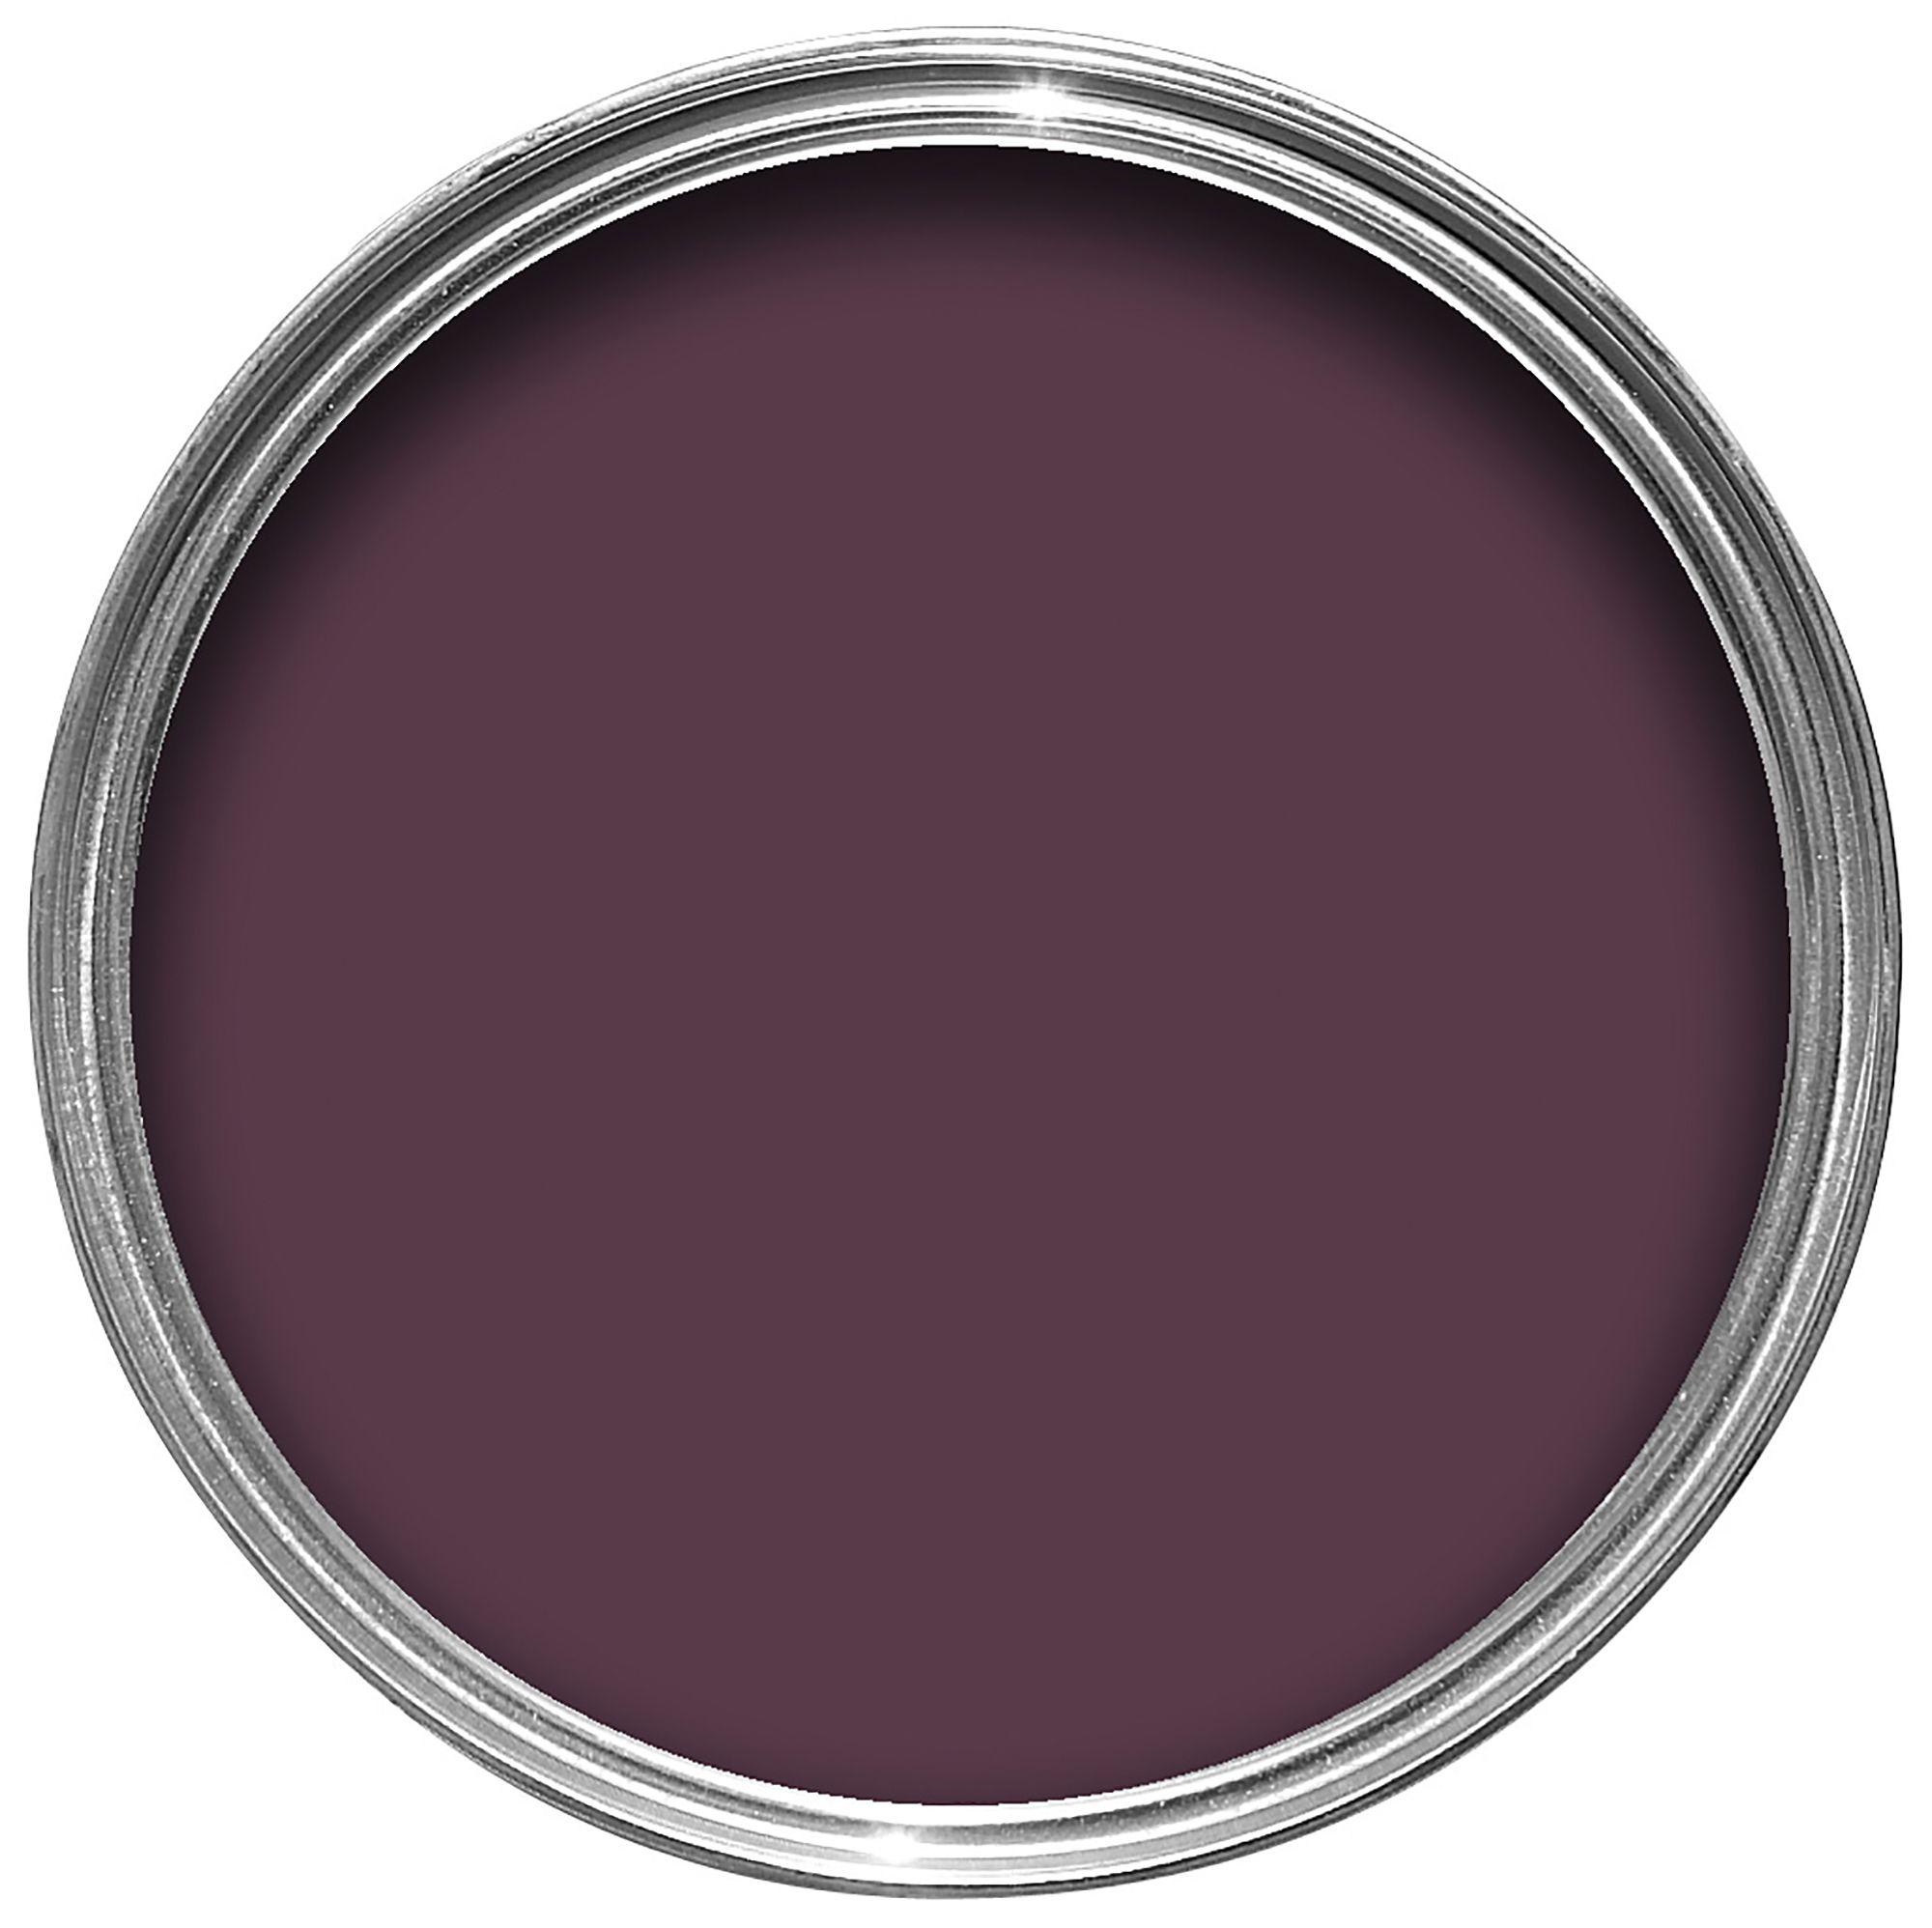 Colours Exterior Dark Plum Gloss Wood & Metal Paint 750ml